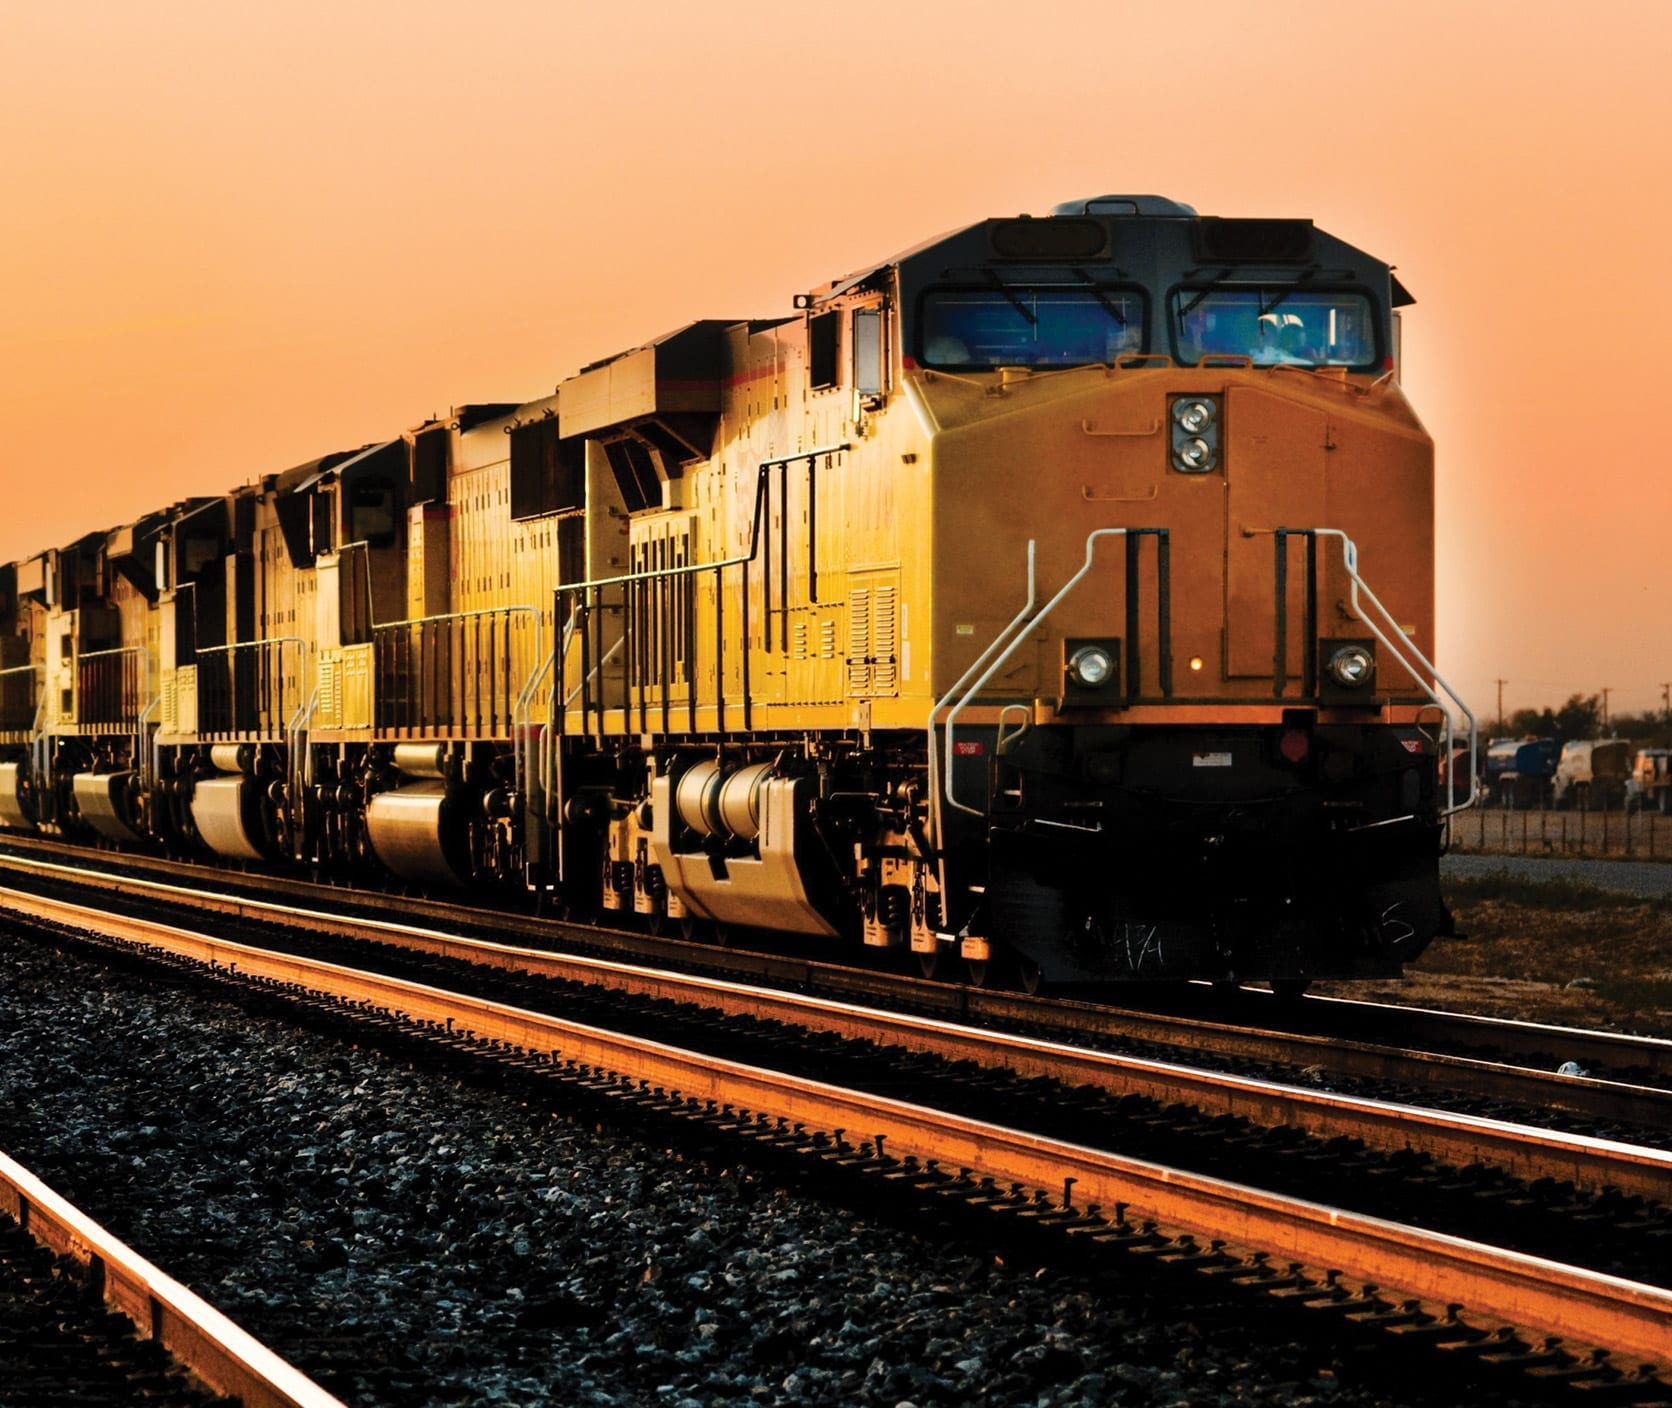 CSX train on railroad track traveling at dusk